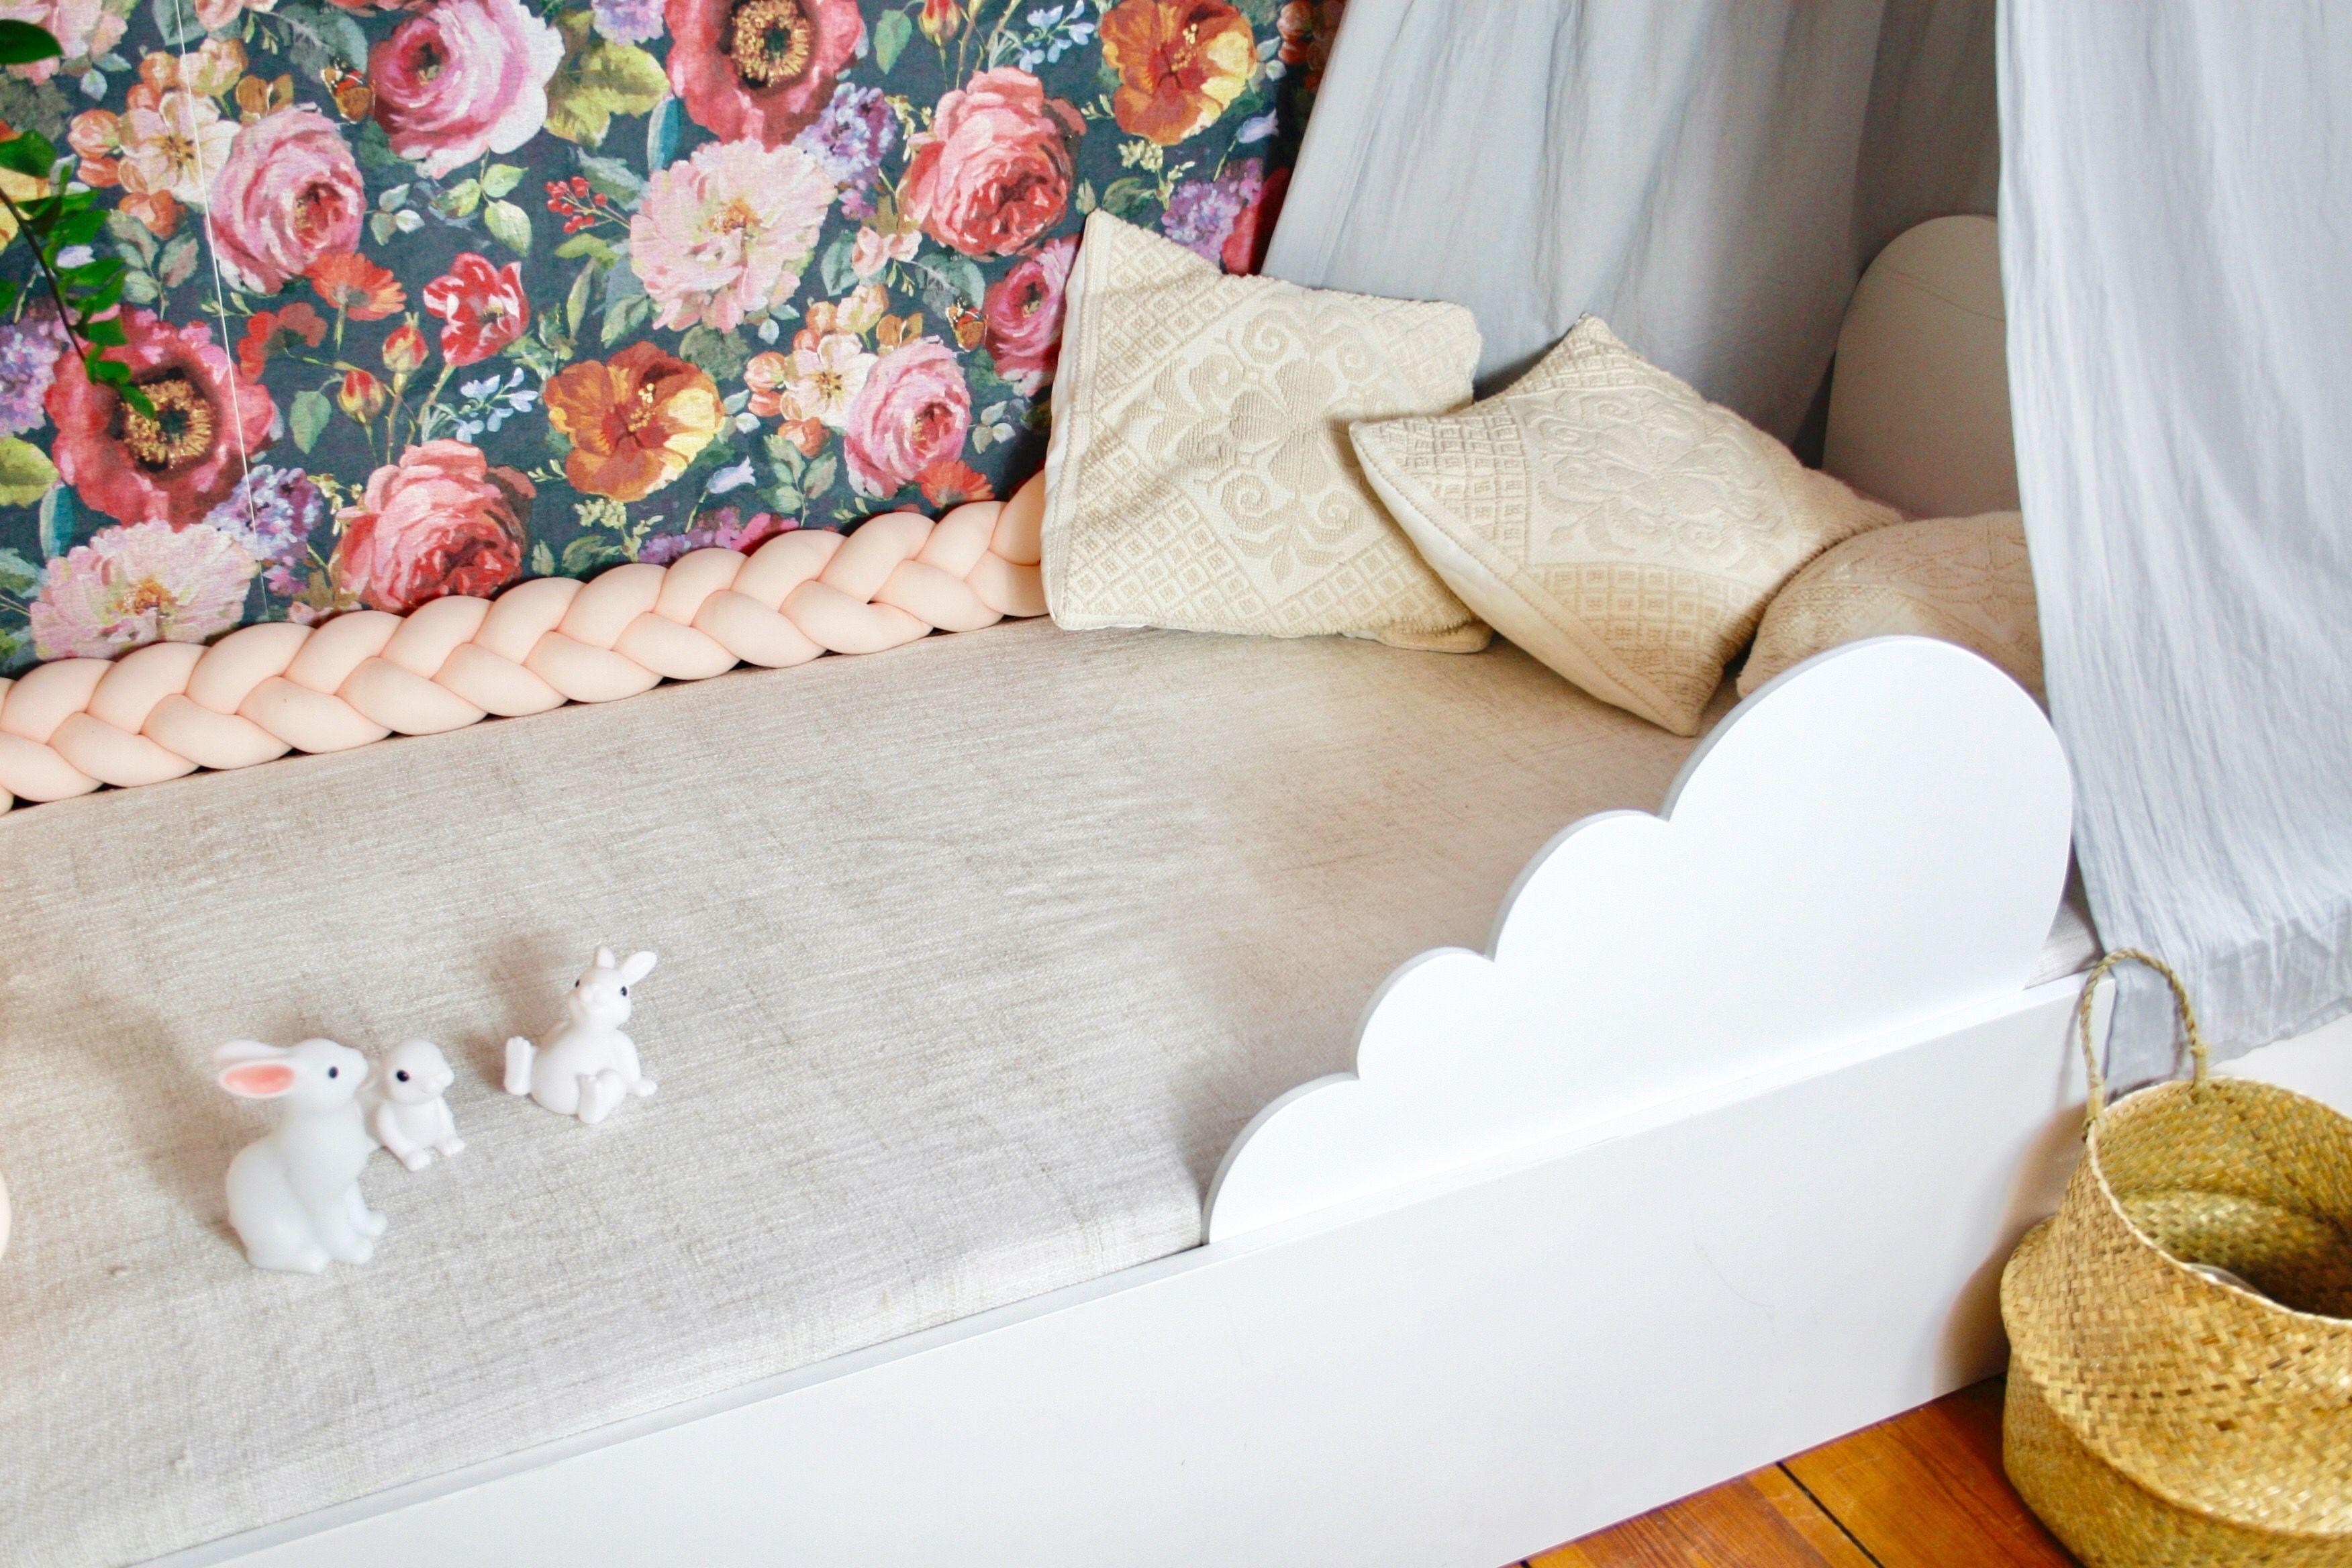 Roomoon Rausfallschutz Bedrail Kinderzimmer Kidsroom Kidsroomdecor